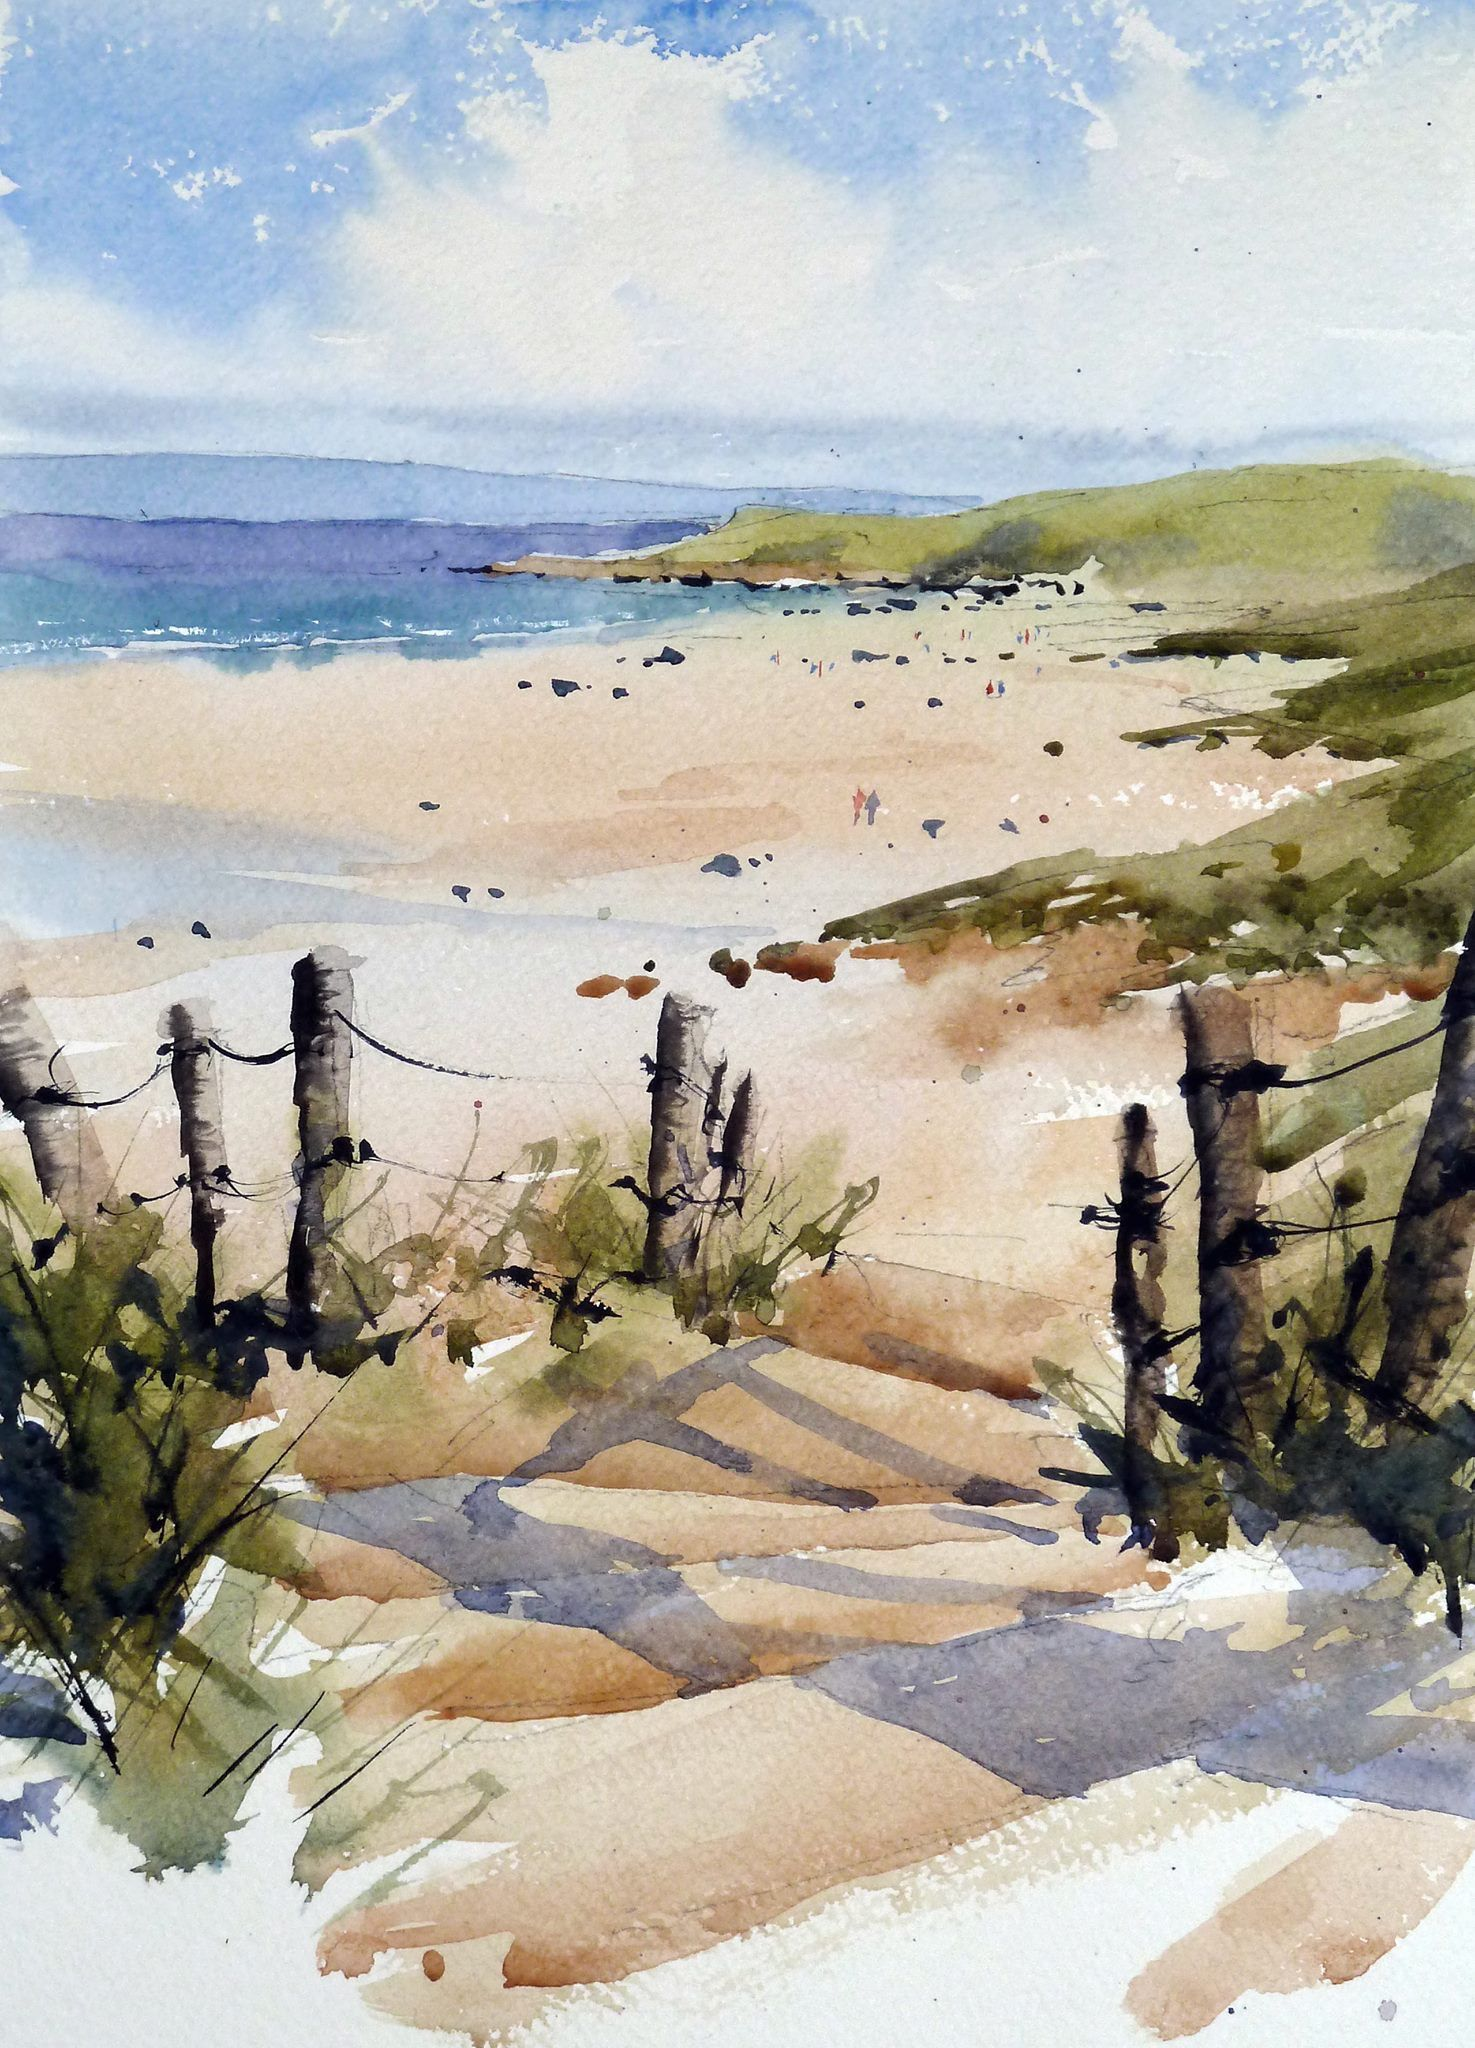 Grahame Booth Plage Aquarelle Paysage De Neige En Peinture